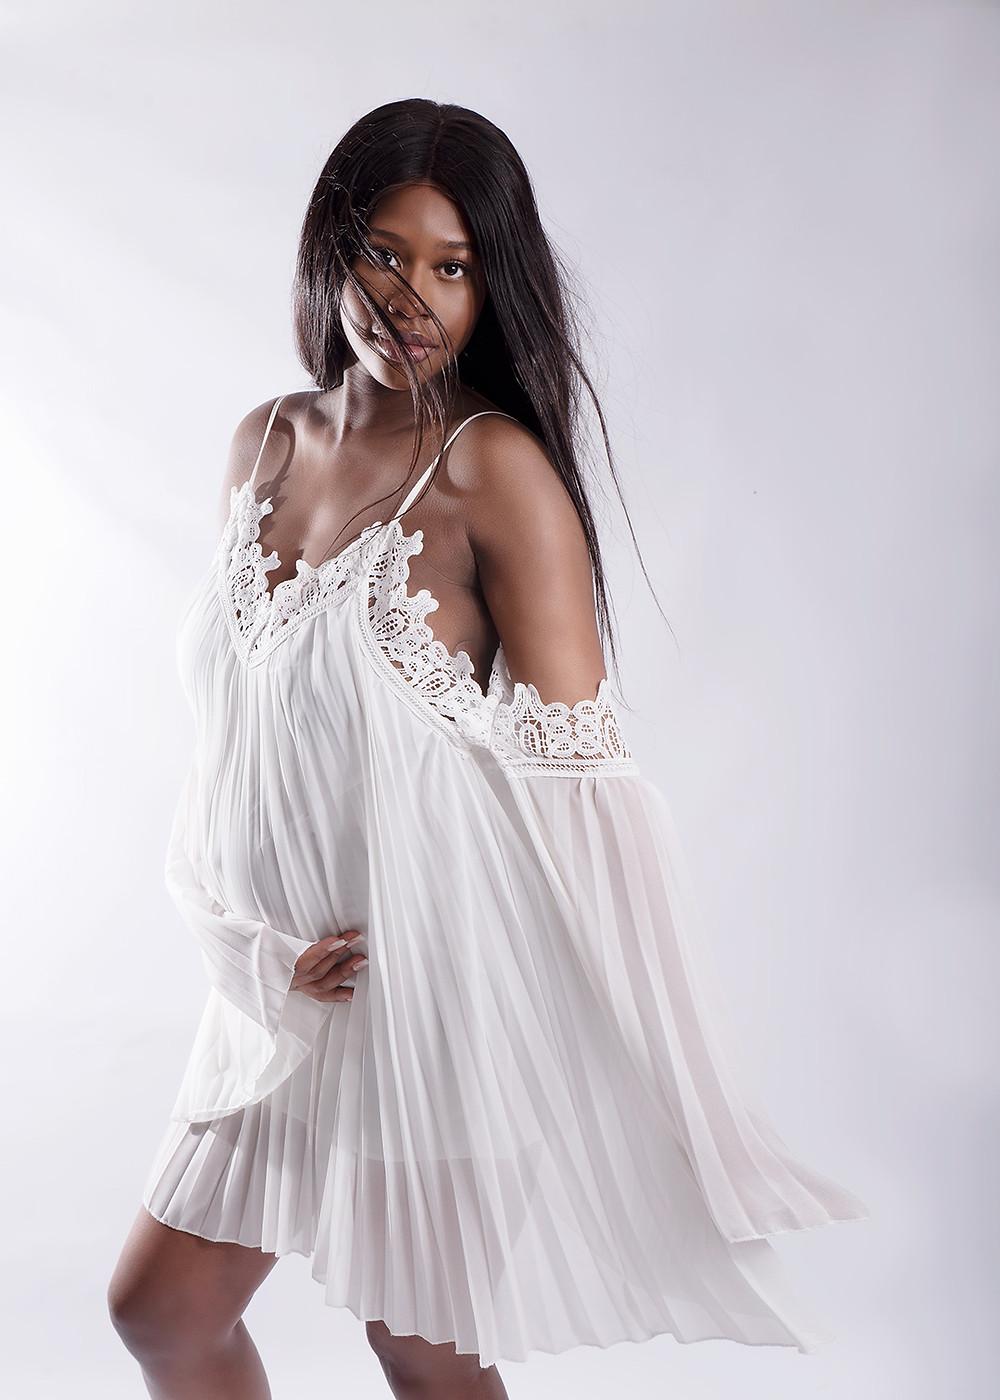 Pregnancy portrait in white maternity dress